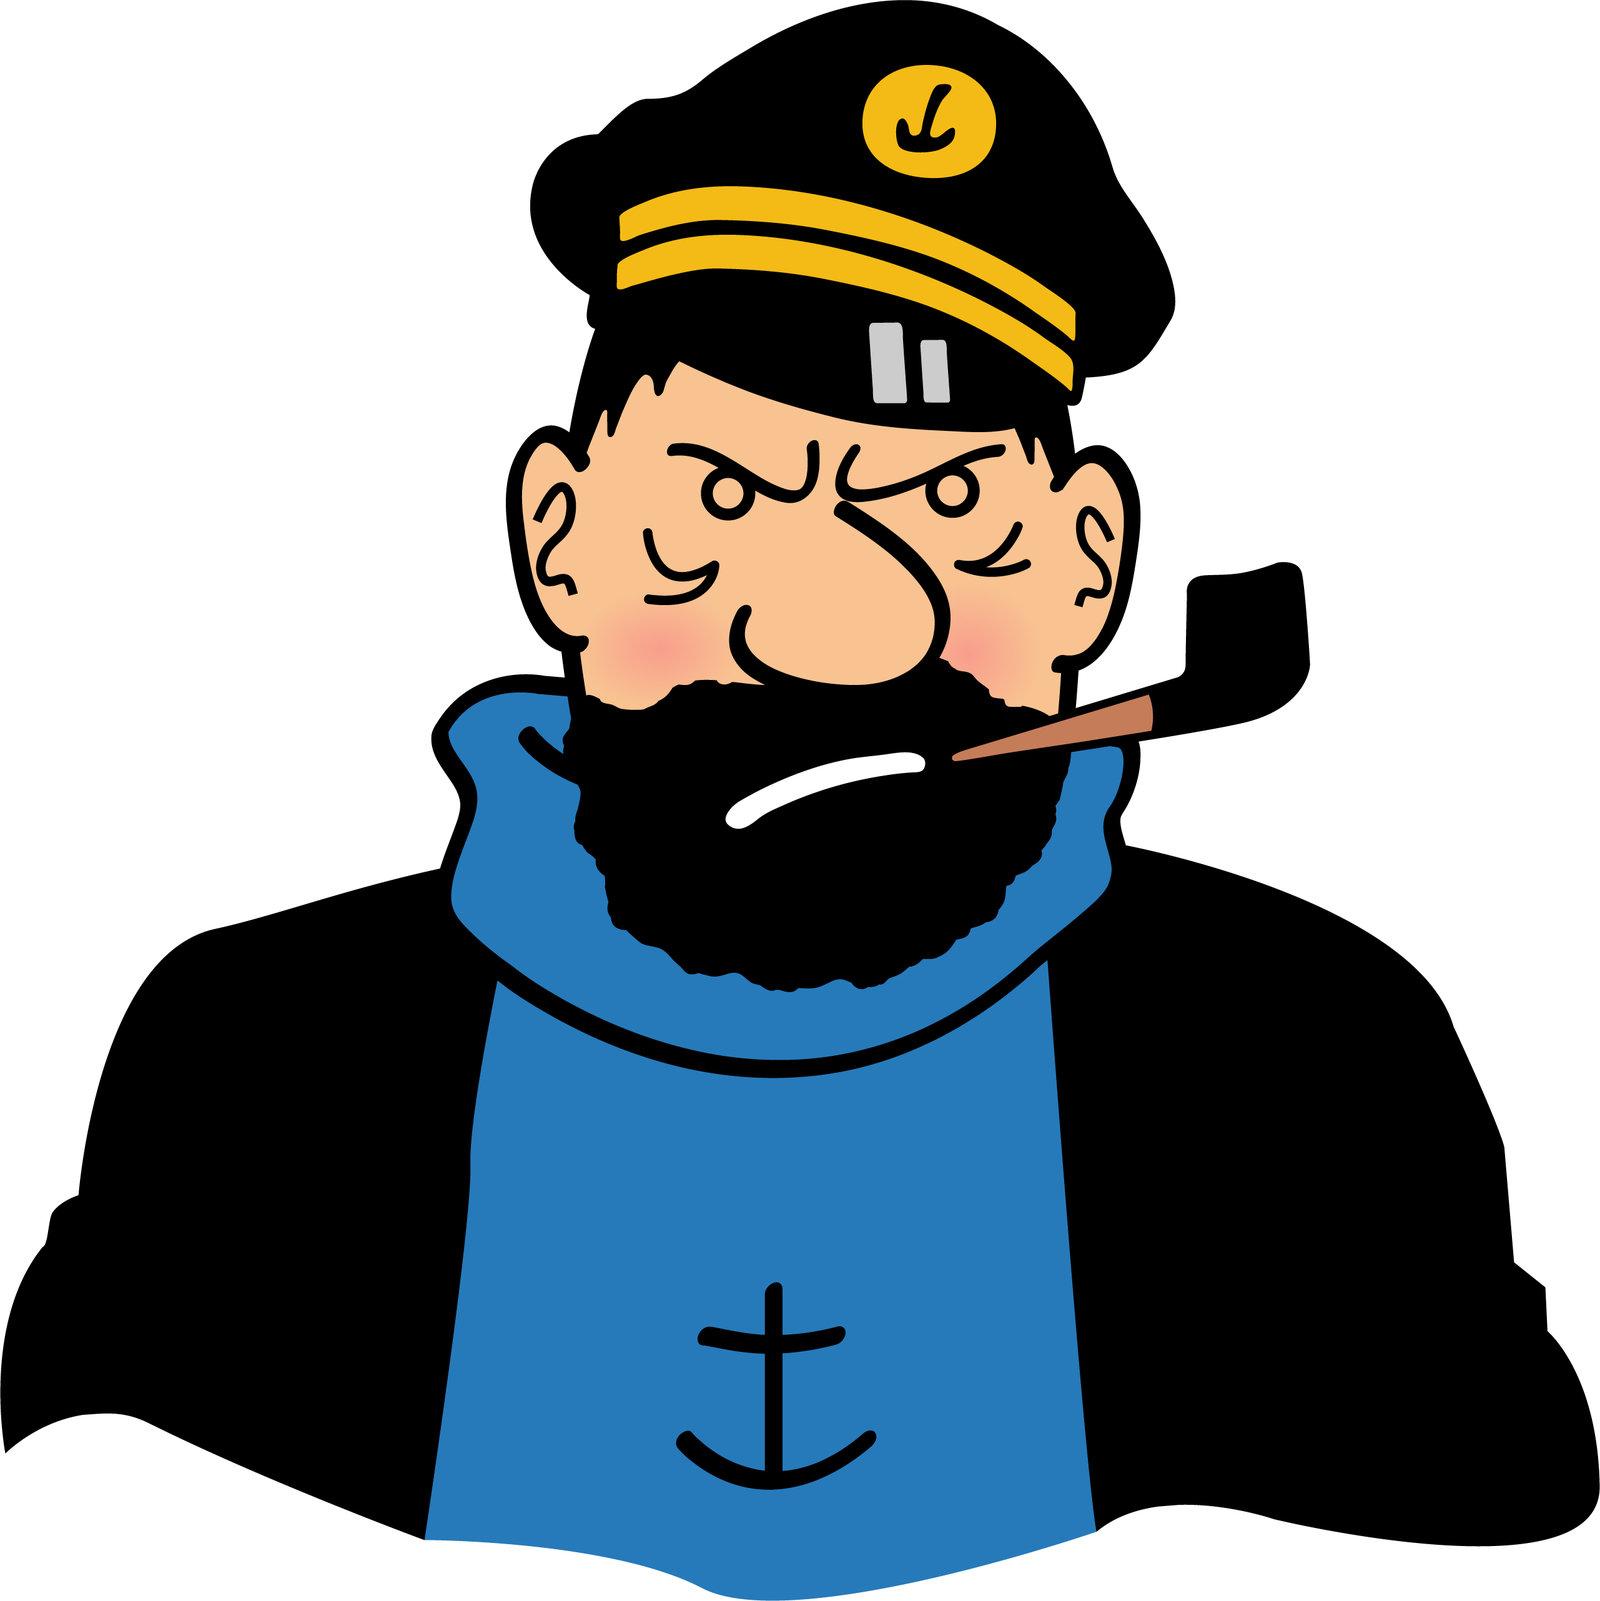 captain_haddock_in_a_bad_mood_by_ironsid0r-d6zl3om.jpg